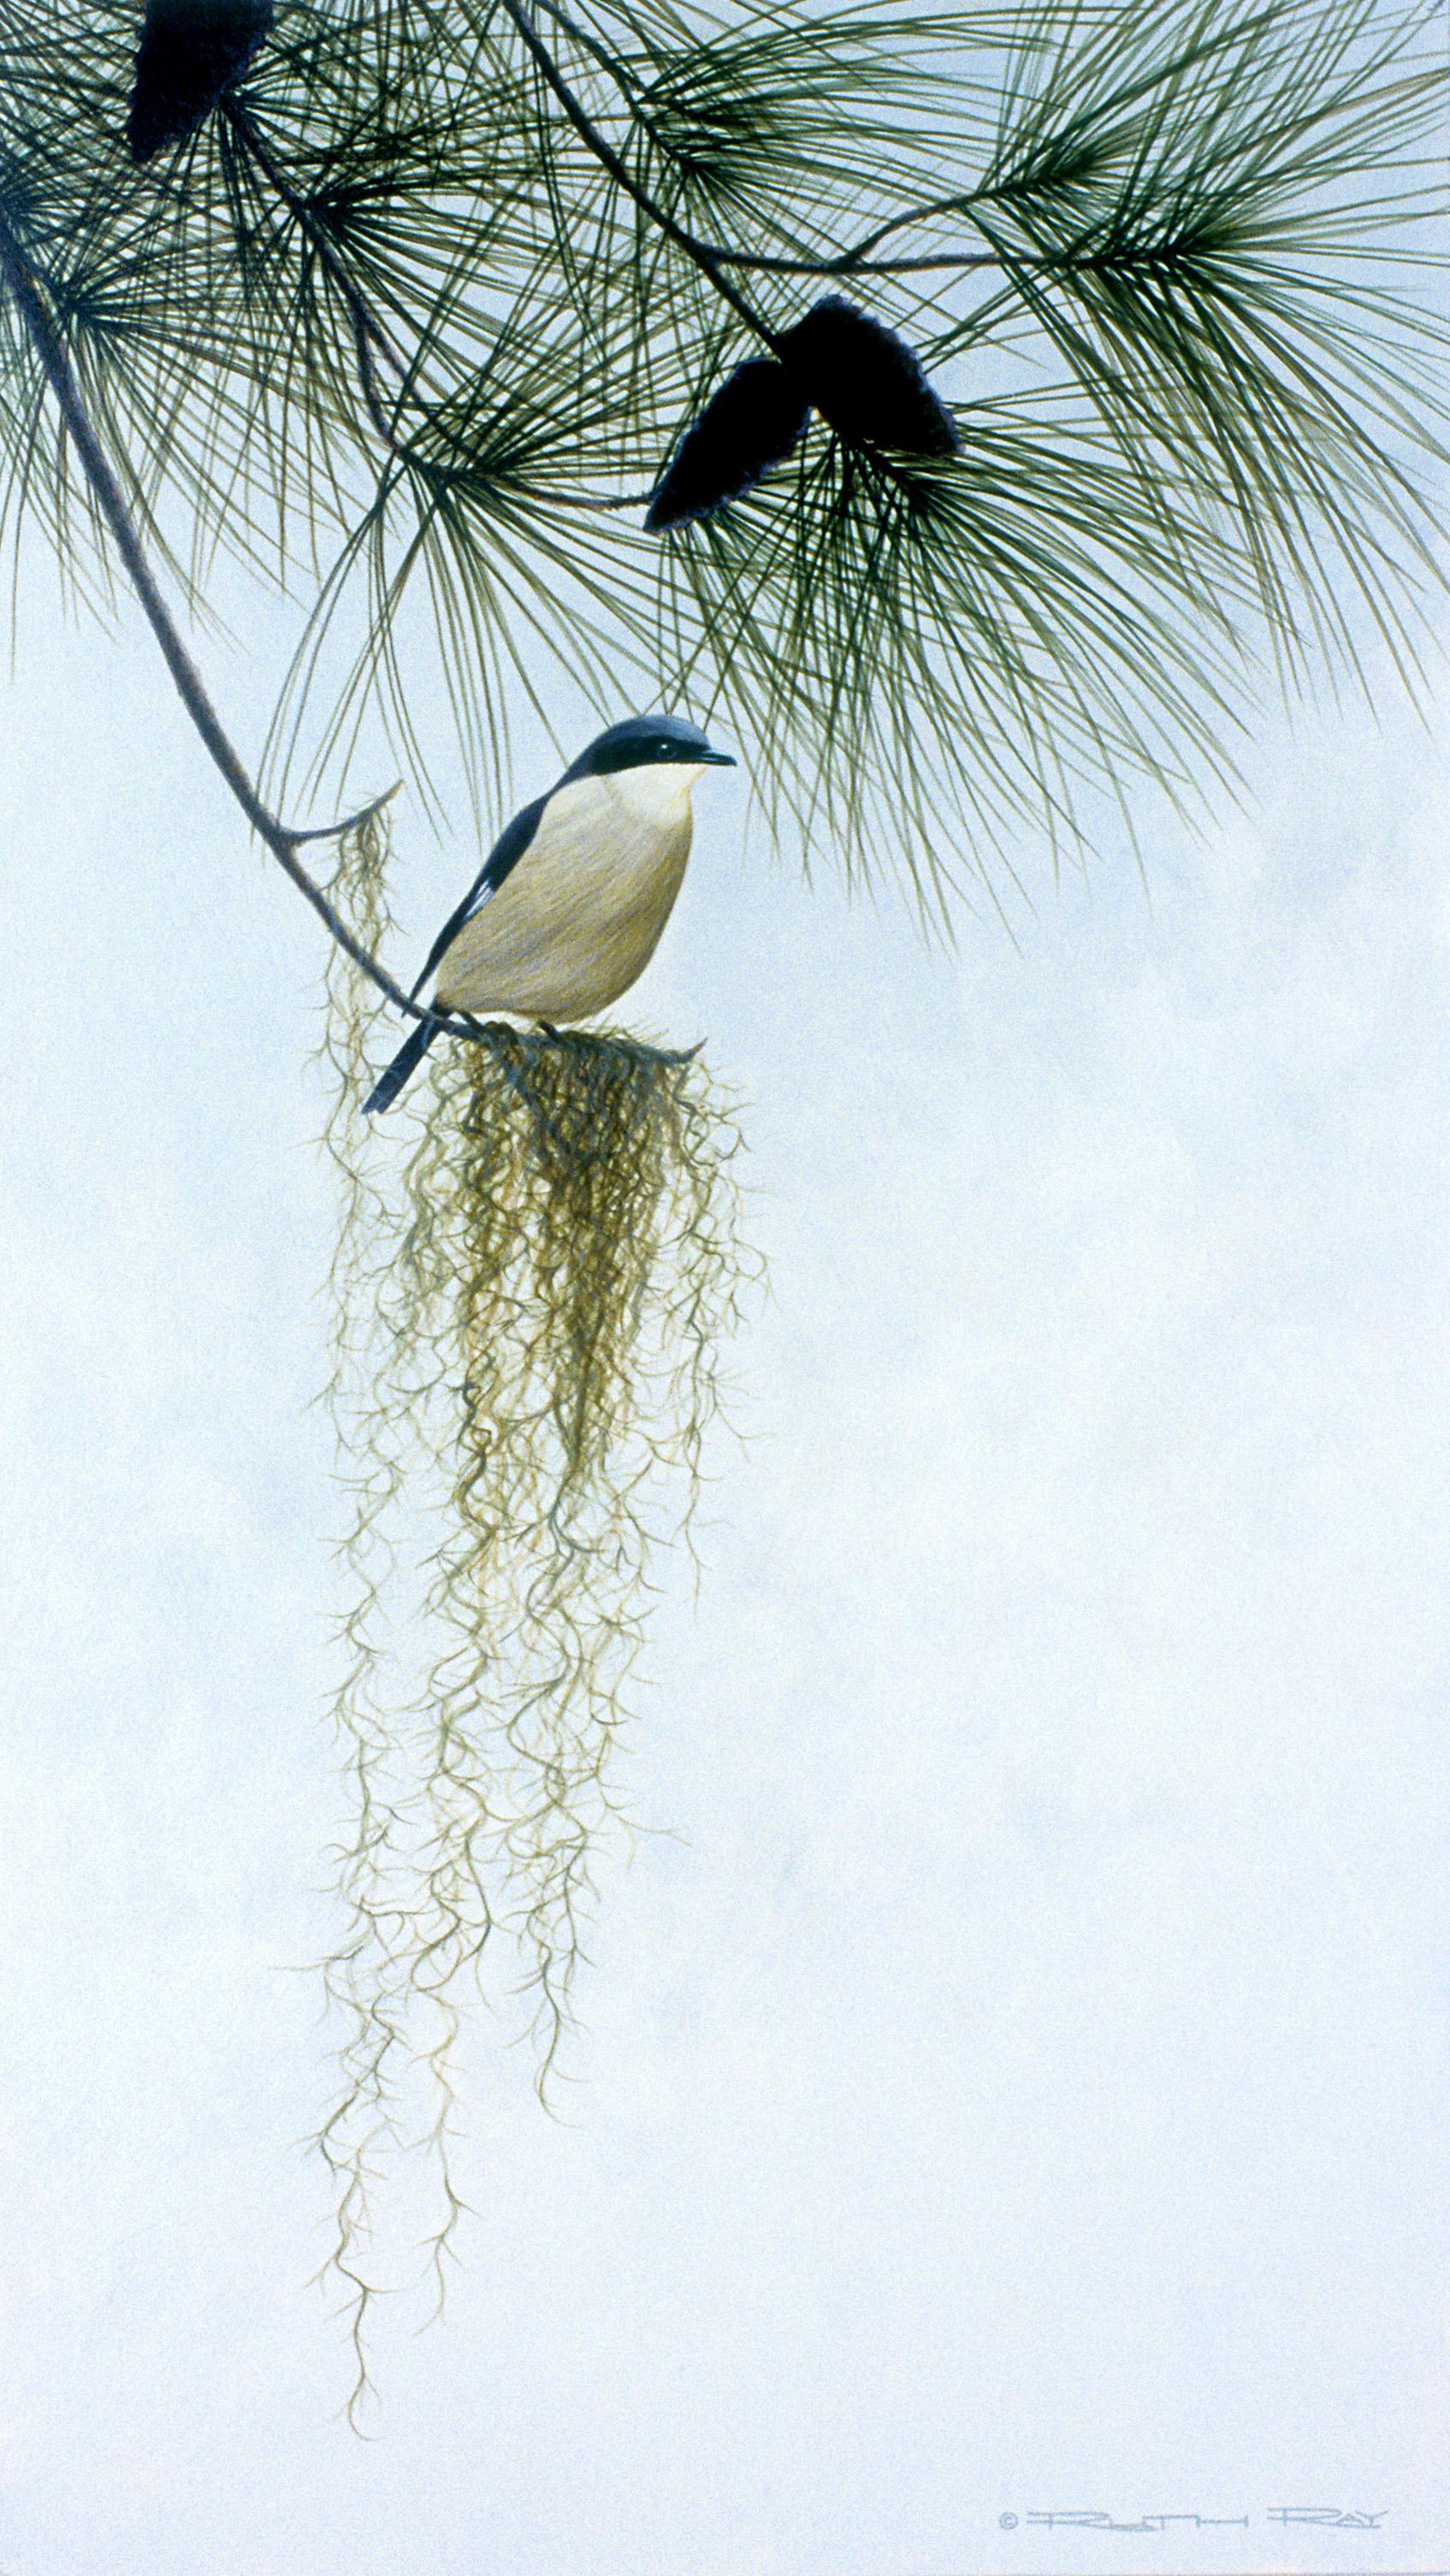 Loggerhead Shrike - 12